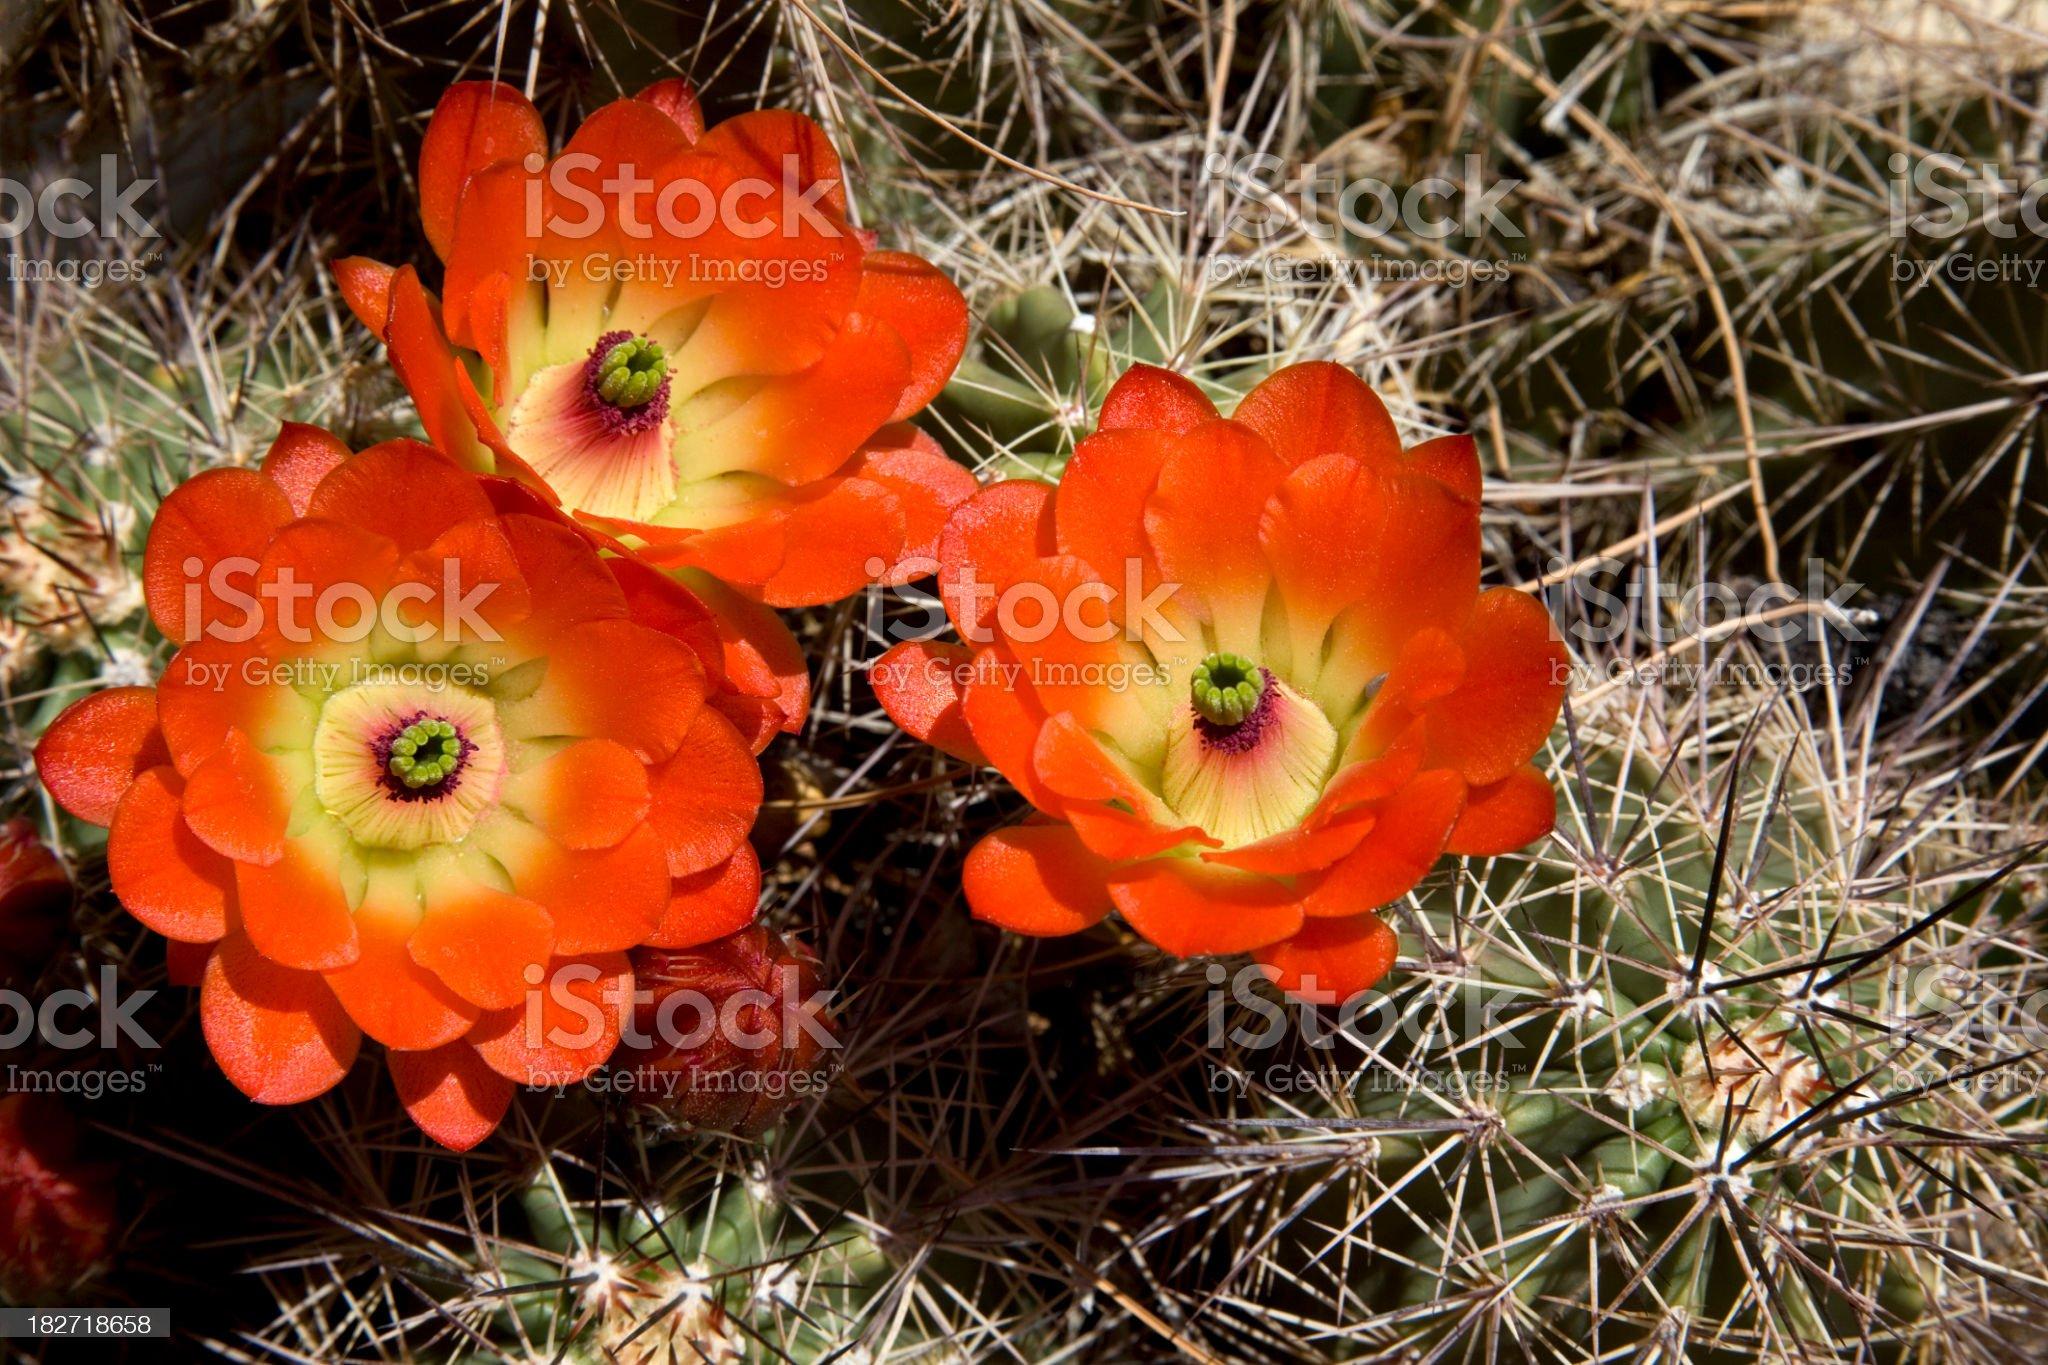 Orange Cactus Flowers royalty-free stock photo